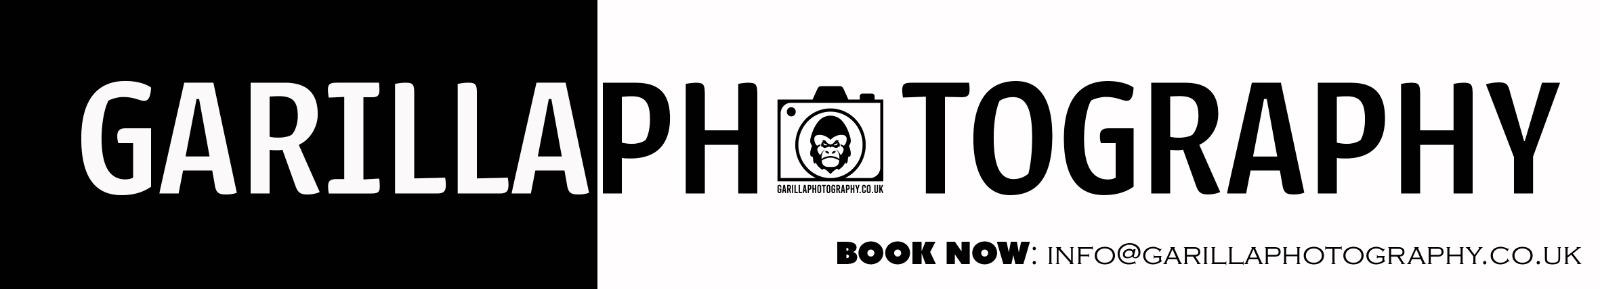 Garillaphotography